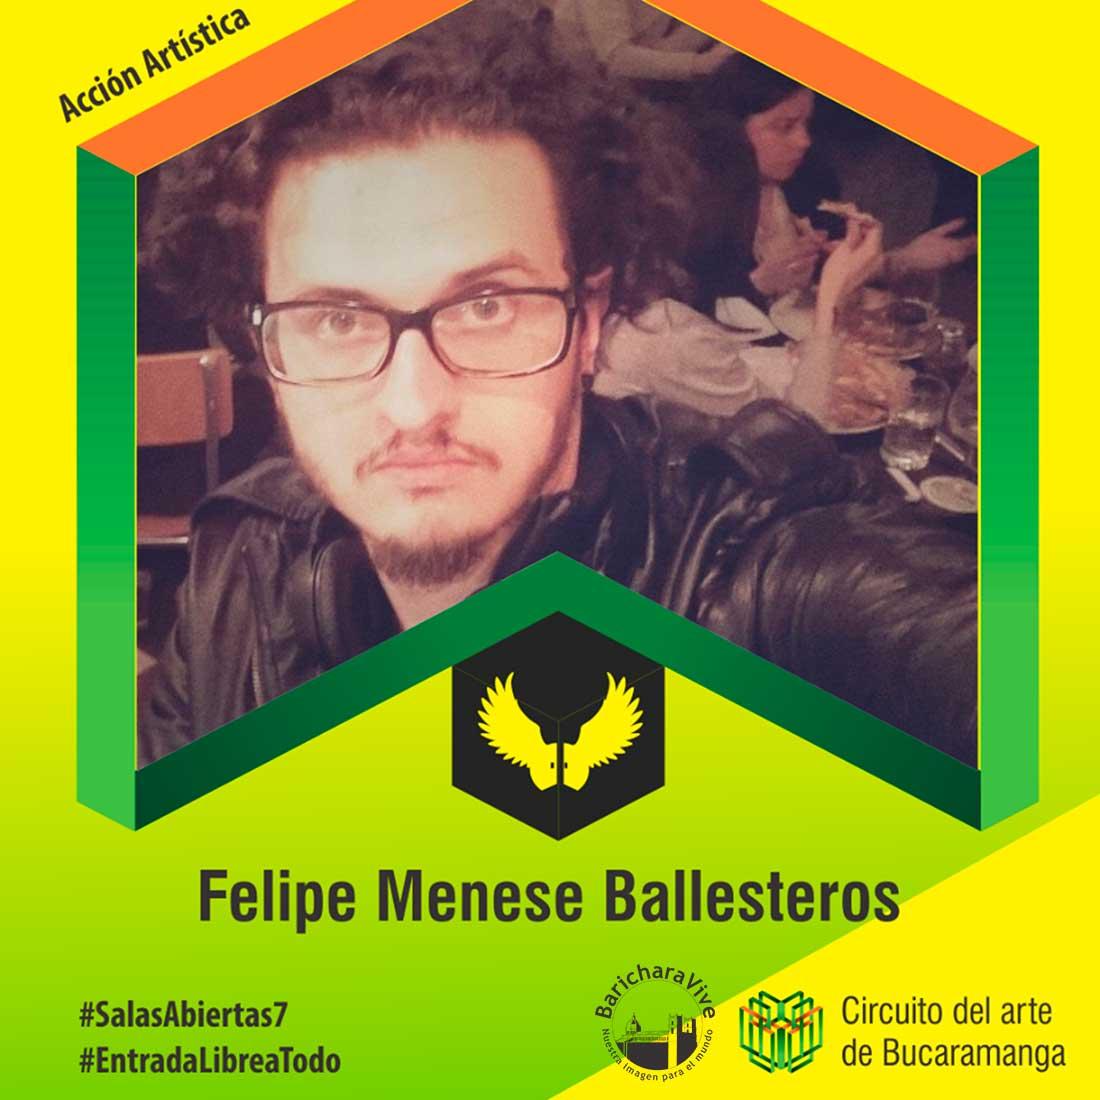 artista-felipe-meneses-ballesteros-7a-edicion-el-centro-con-las-salas-abiertas-bucaramanga-2017